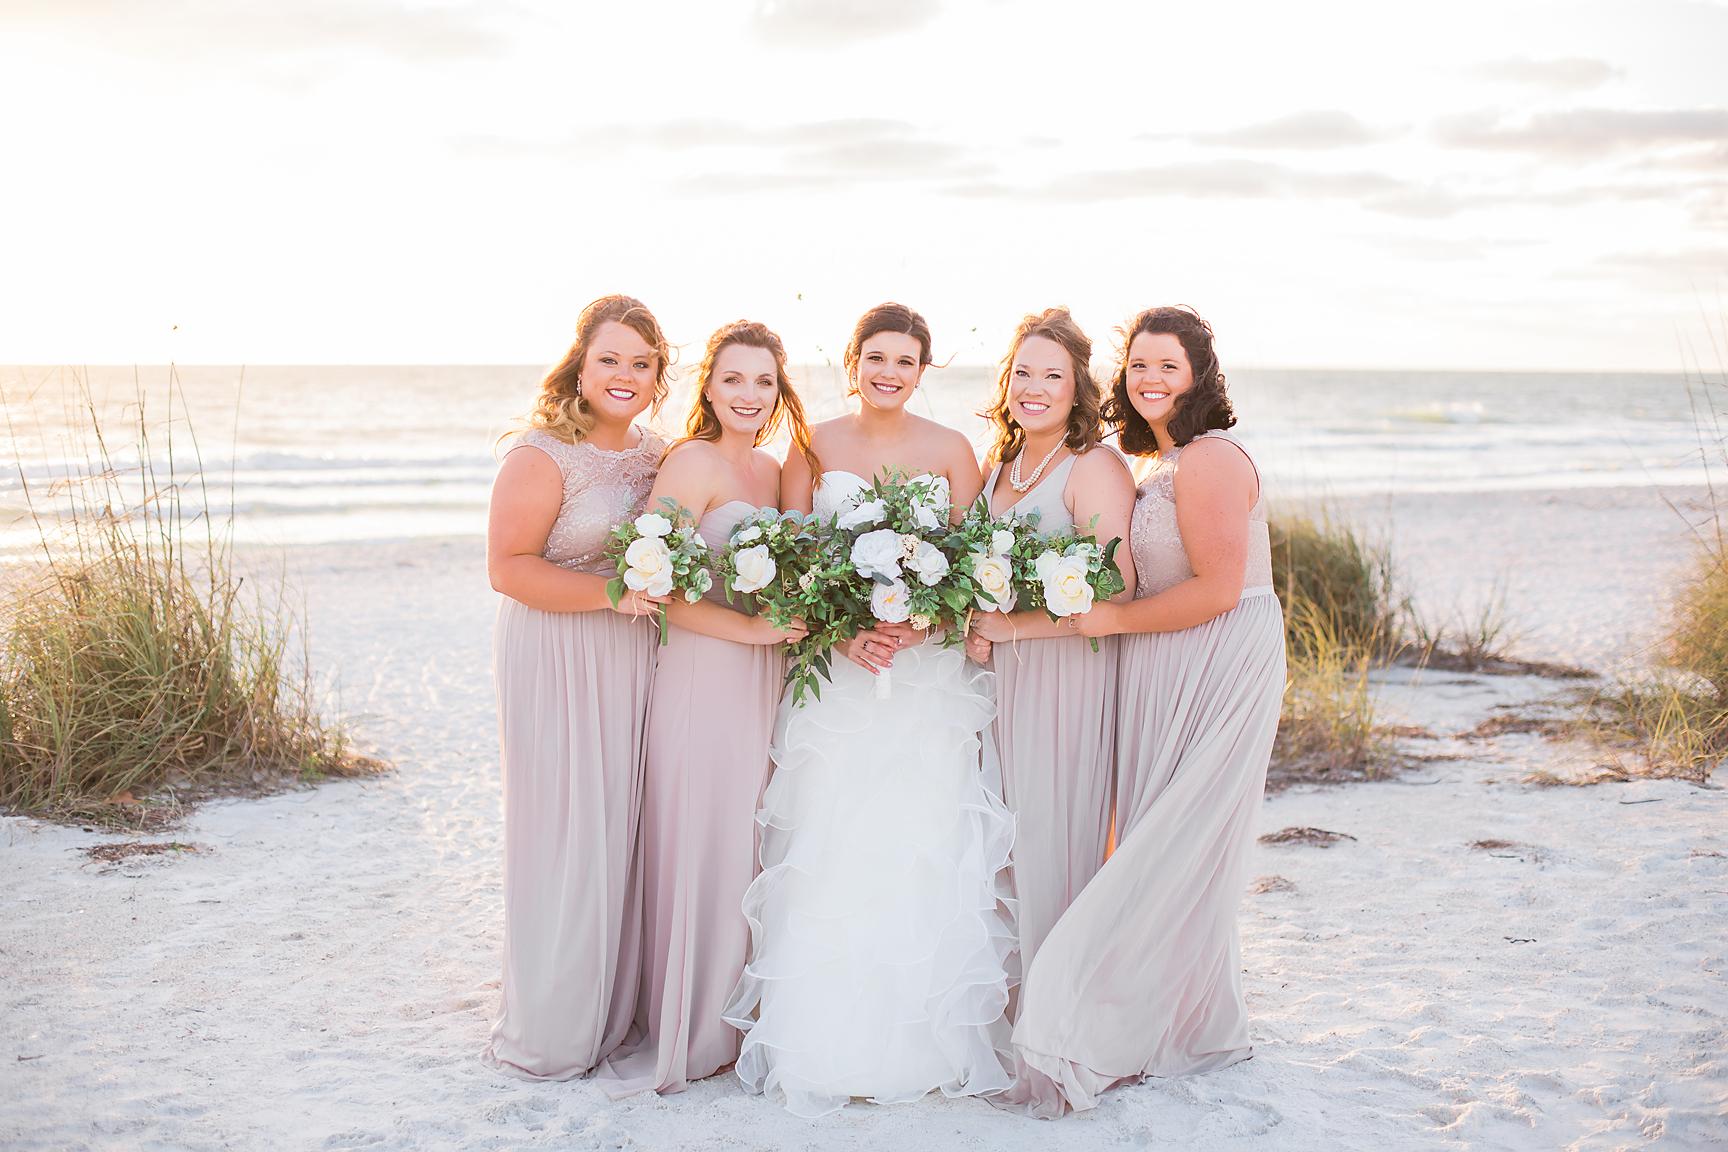 Bailey + Chalin - Anna Maria Island Wedding Photographer - Destination Wedding Photography - Emily & Co. Photography - Beach Wedding Photography 4.jpg